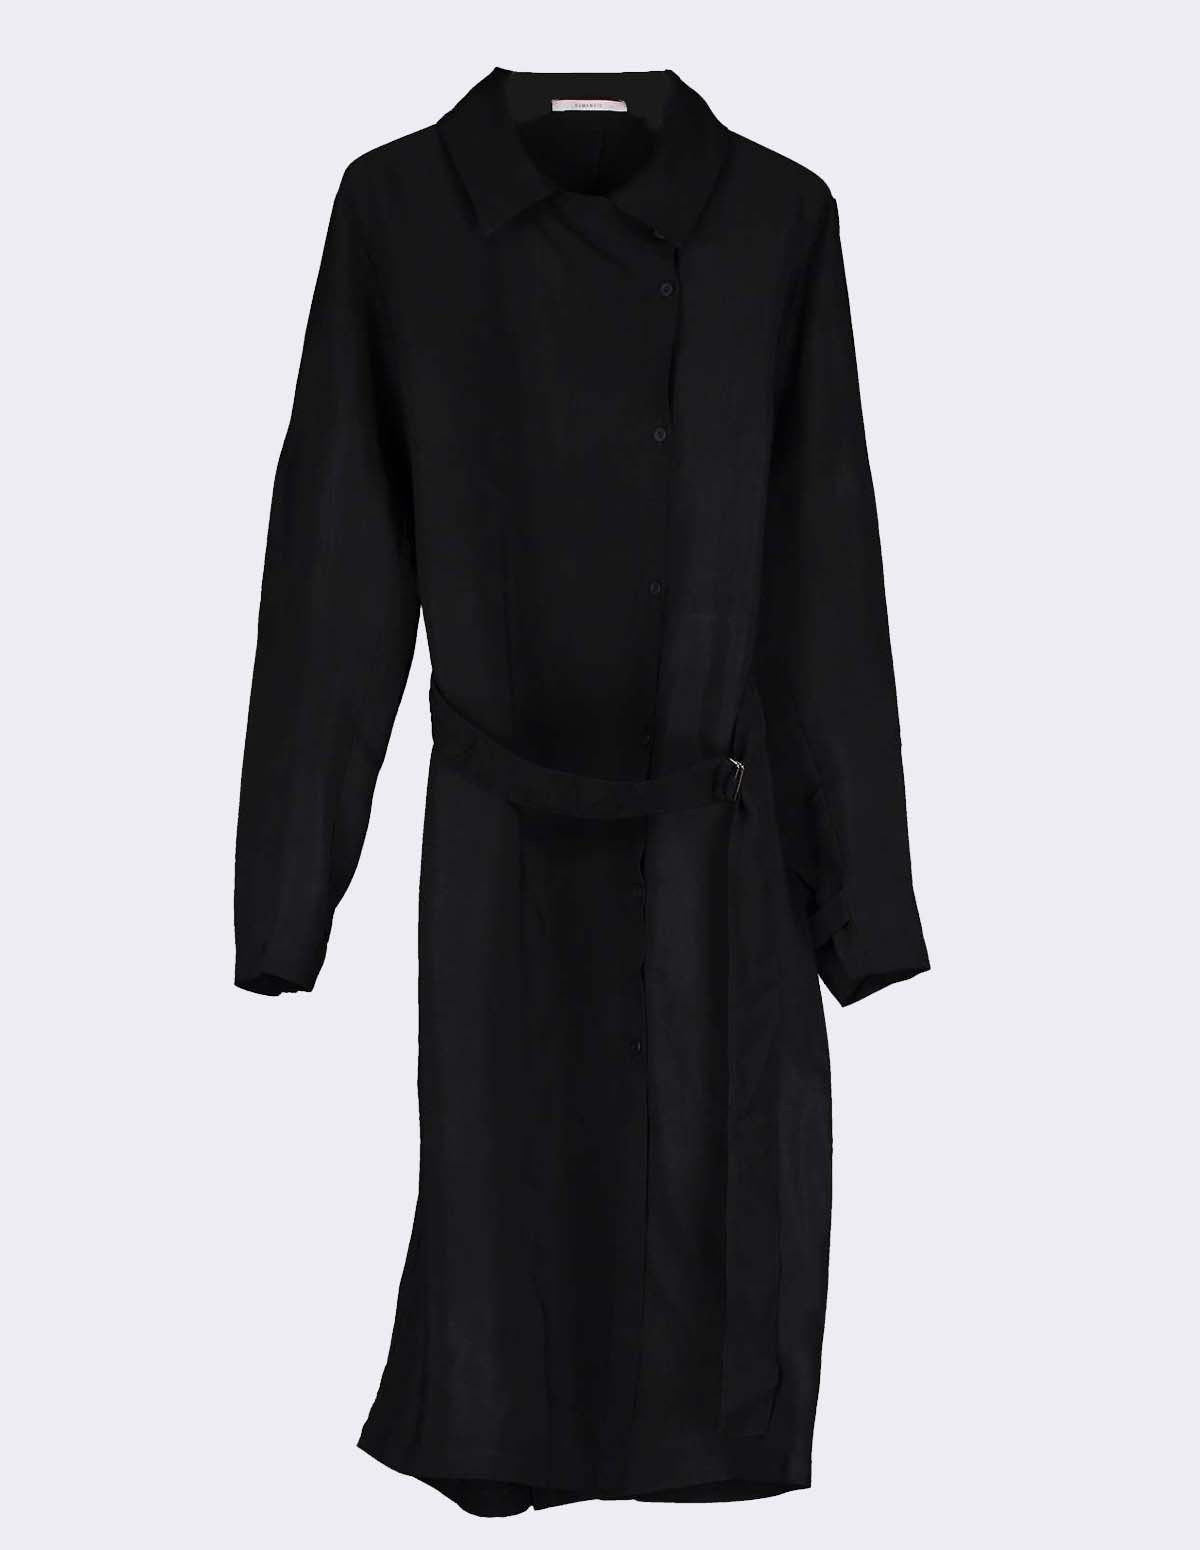 Huma Ginya Dress - BLACKISH